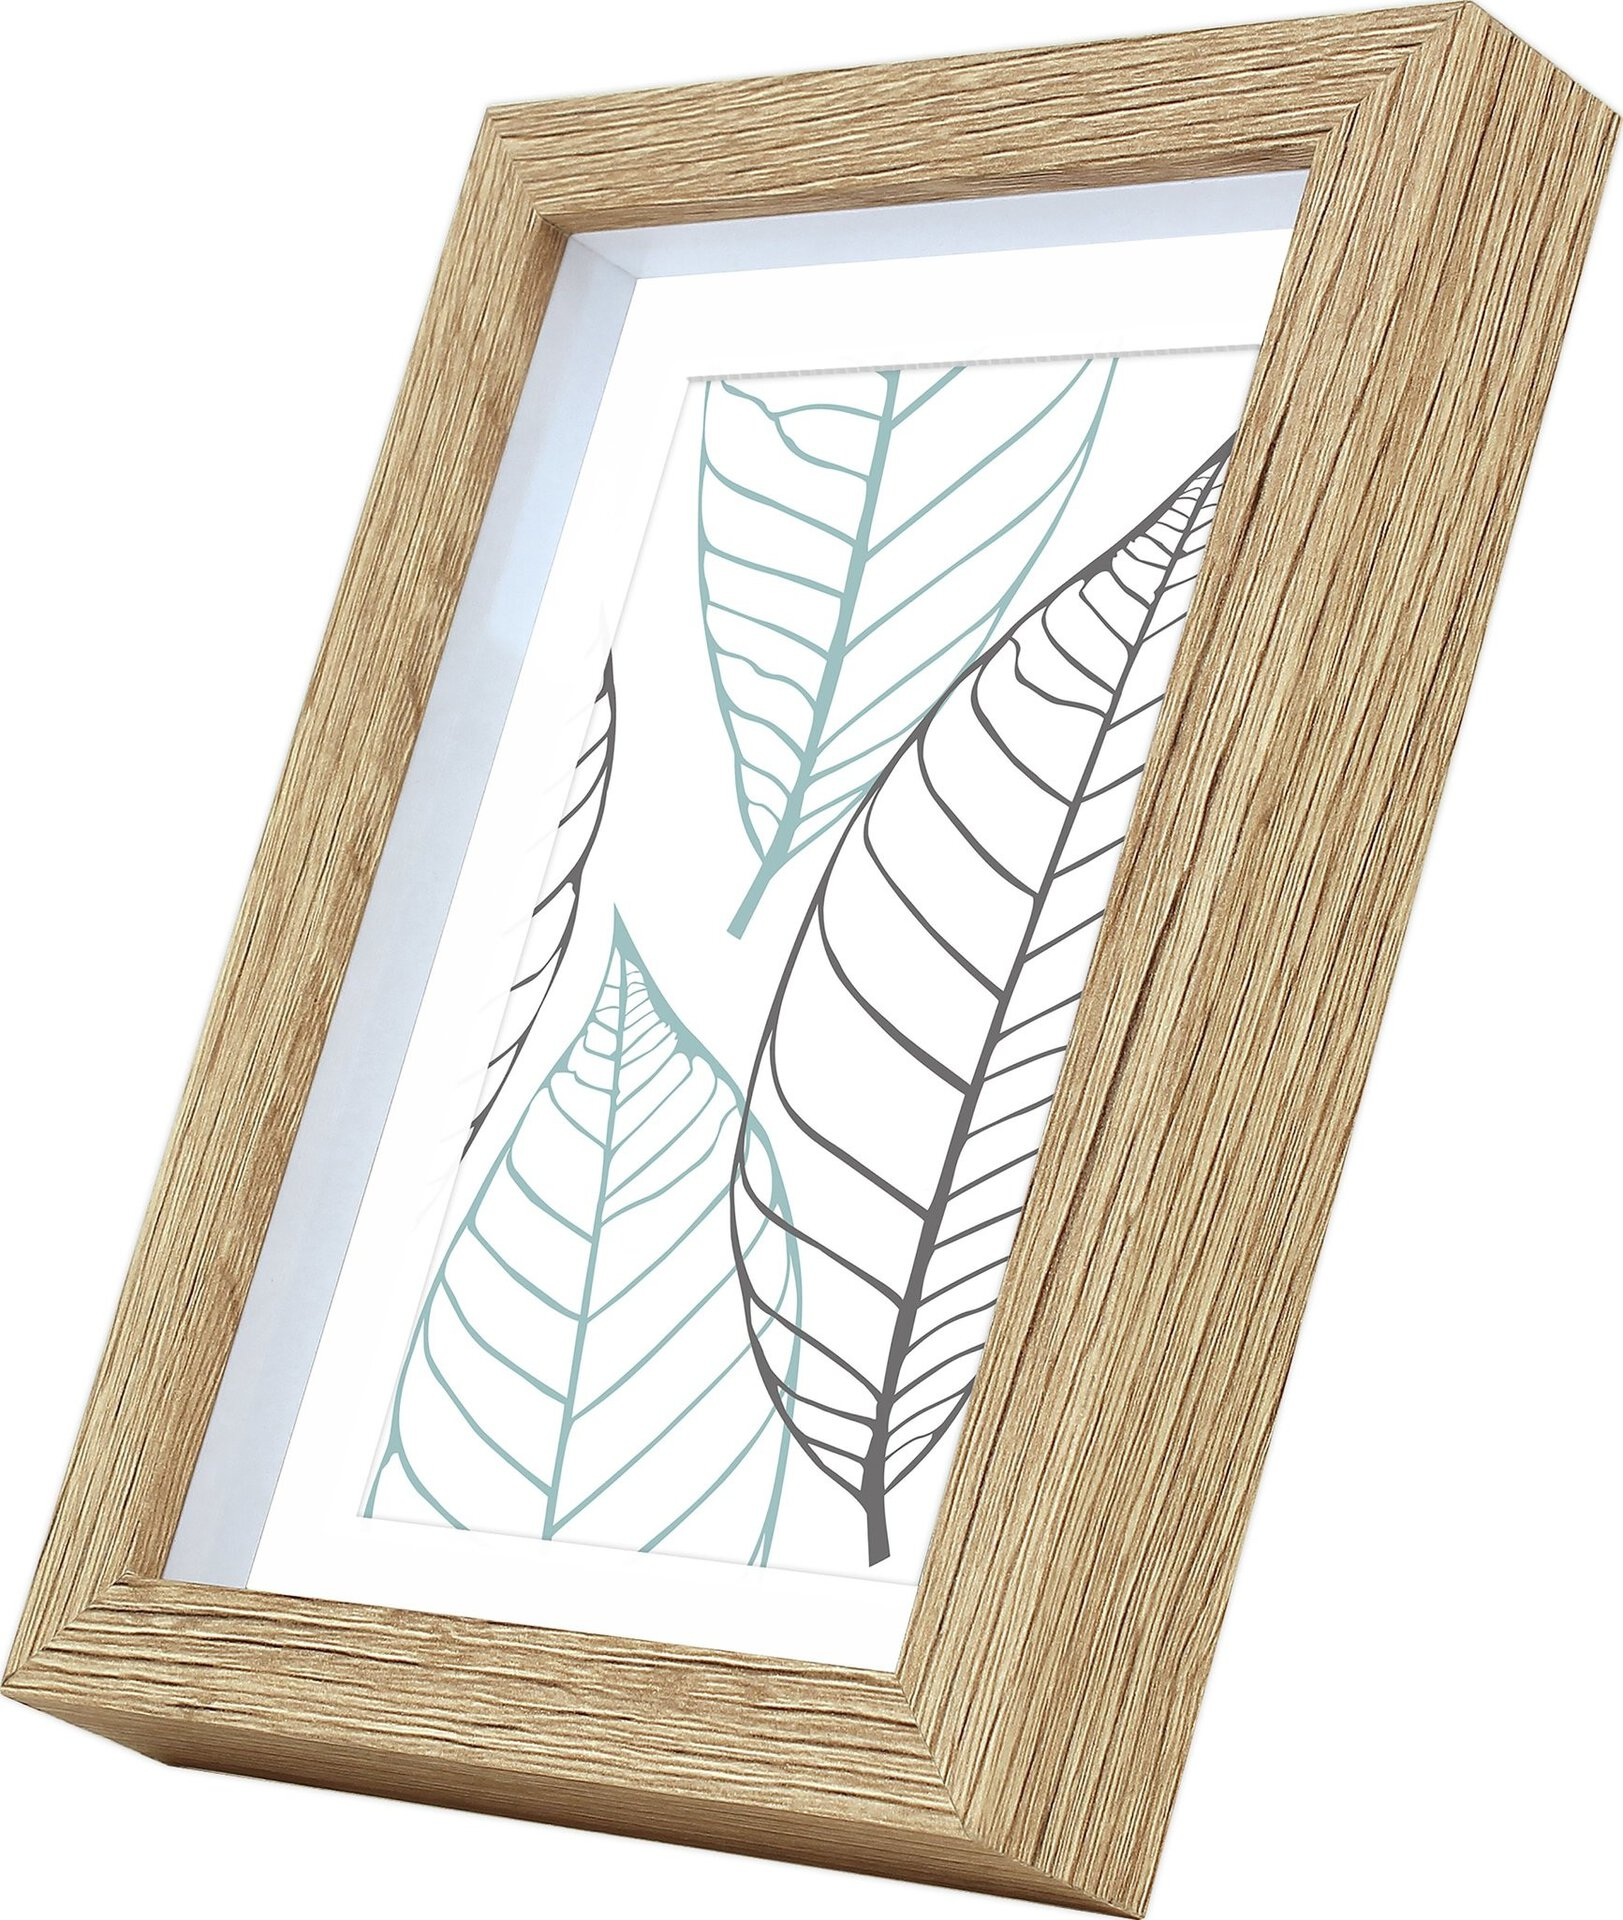 Bilderrahmen ICELAND INTERTRADING Holz 15 x 20 x 3 cm